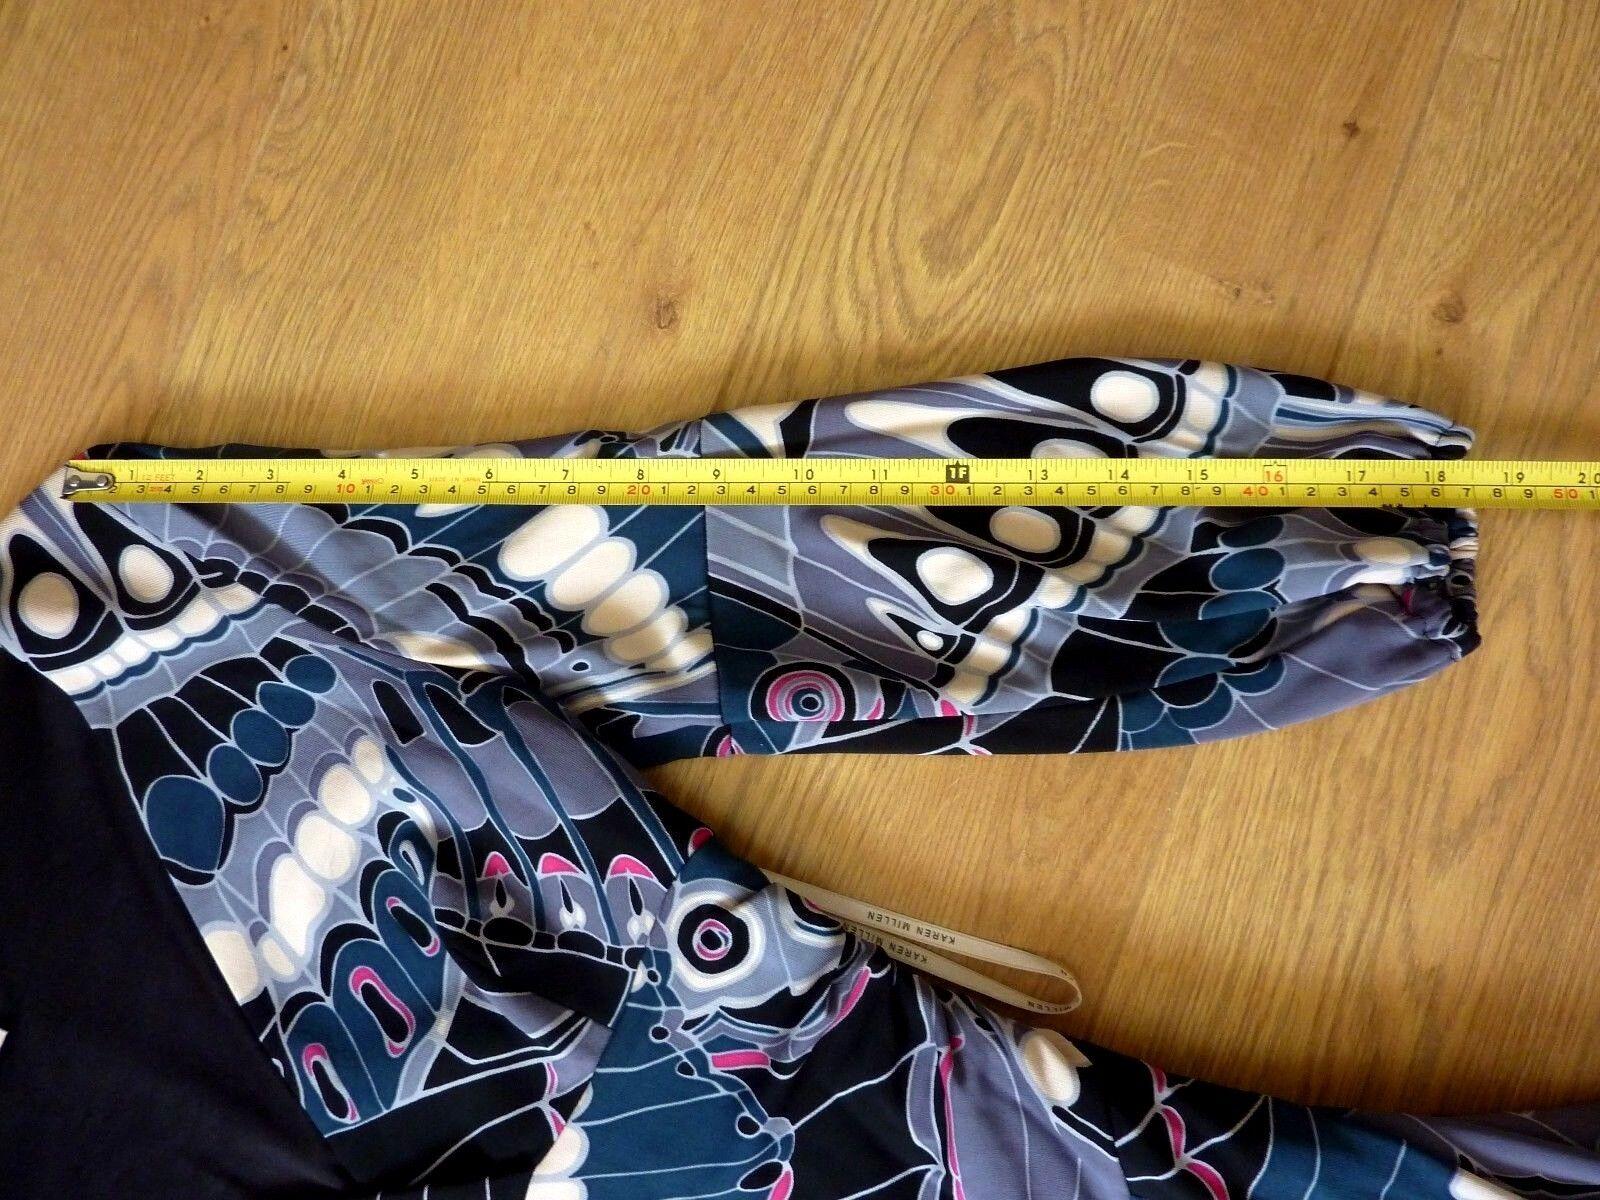 KAREN MILLEN Ladies Butterfly Pattern Stretchy Dress Größe UK 10 10 10 EU 38 US 6 faa5d4